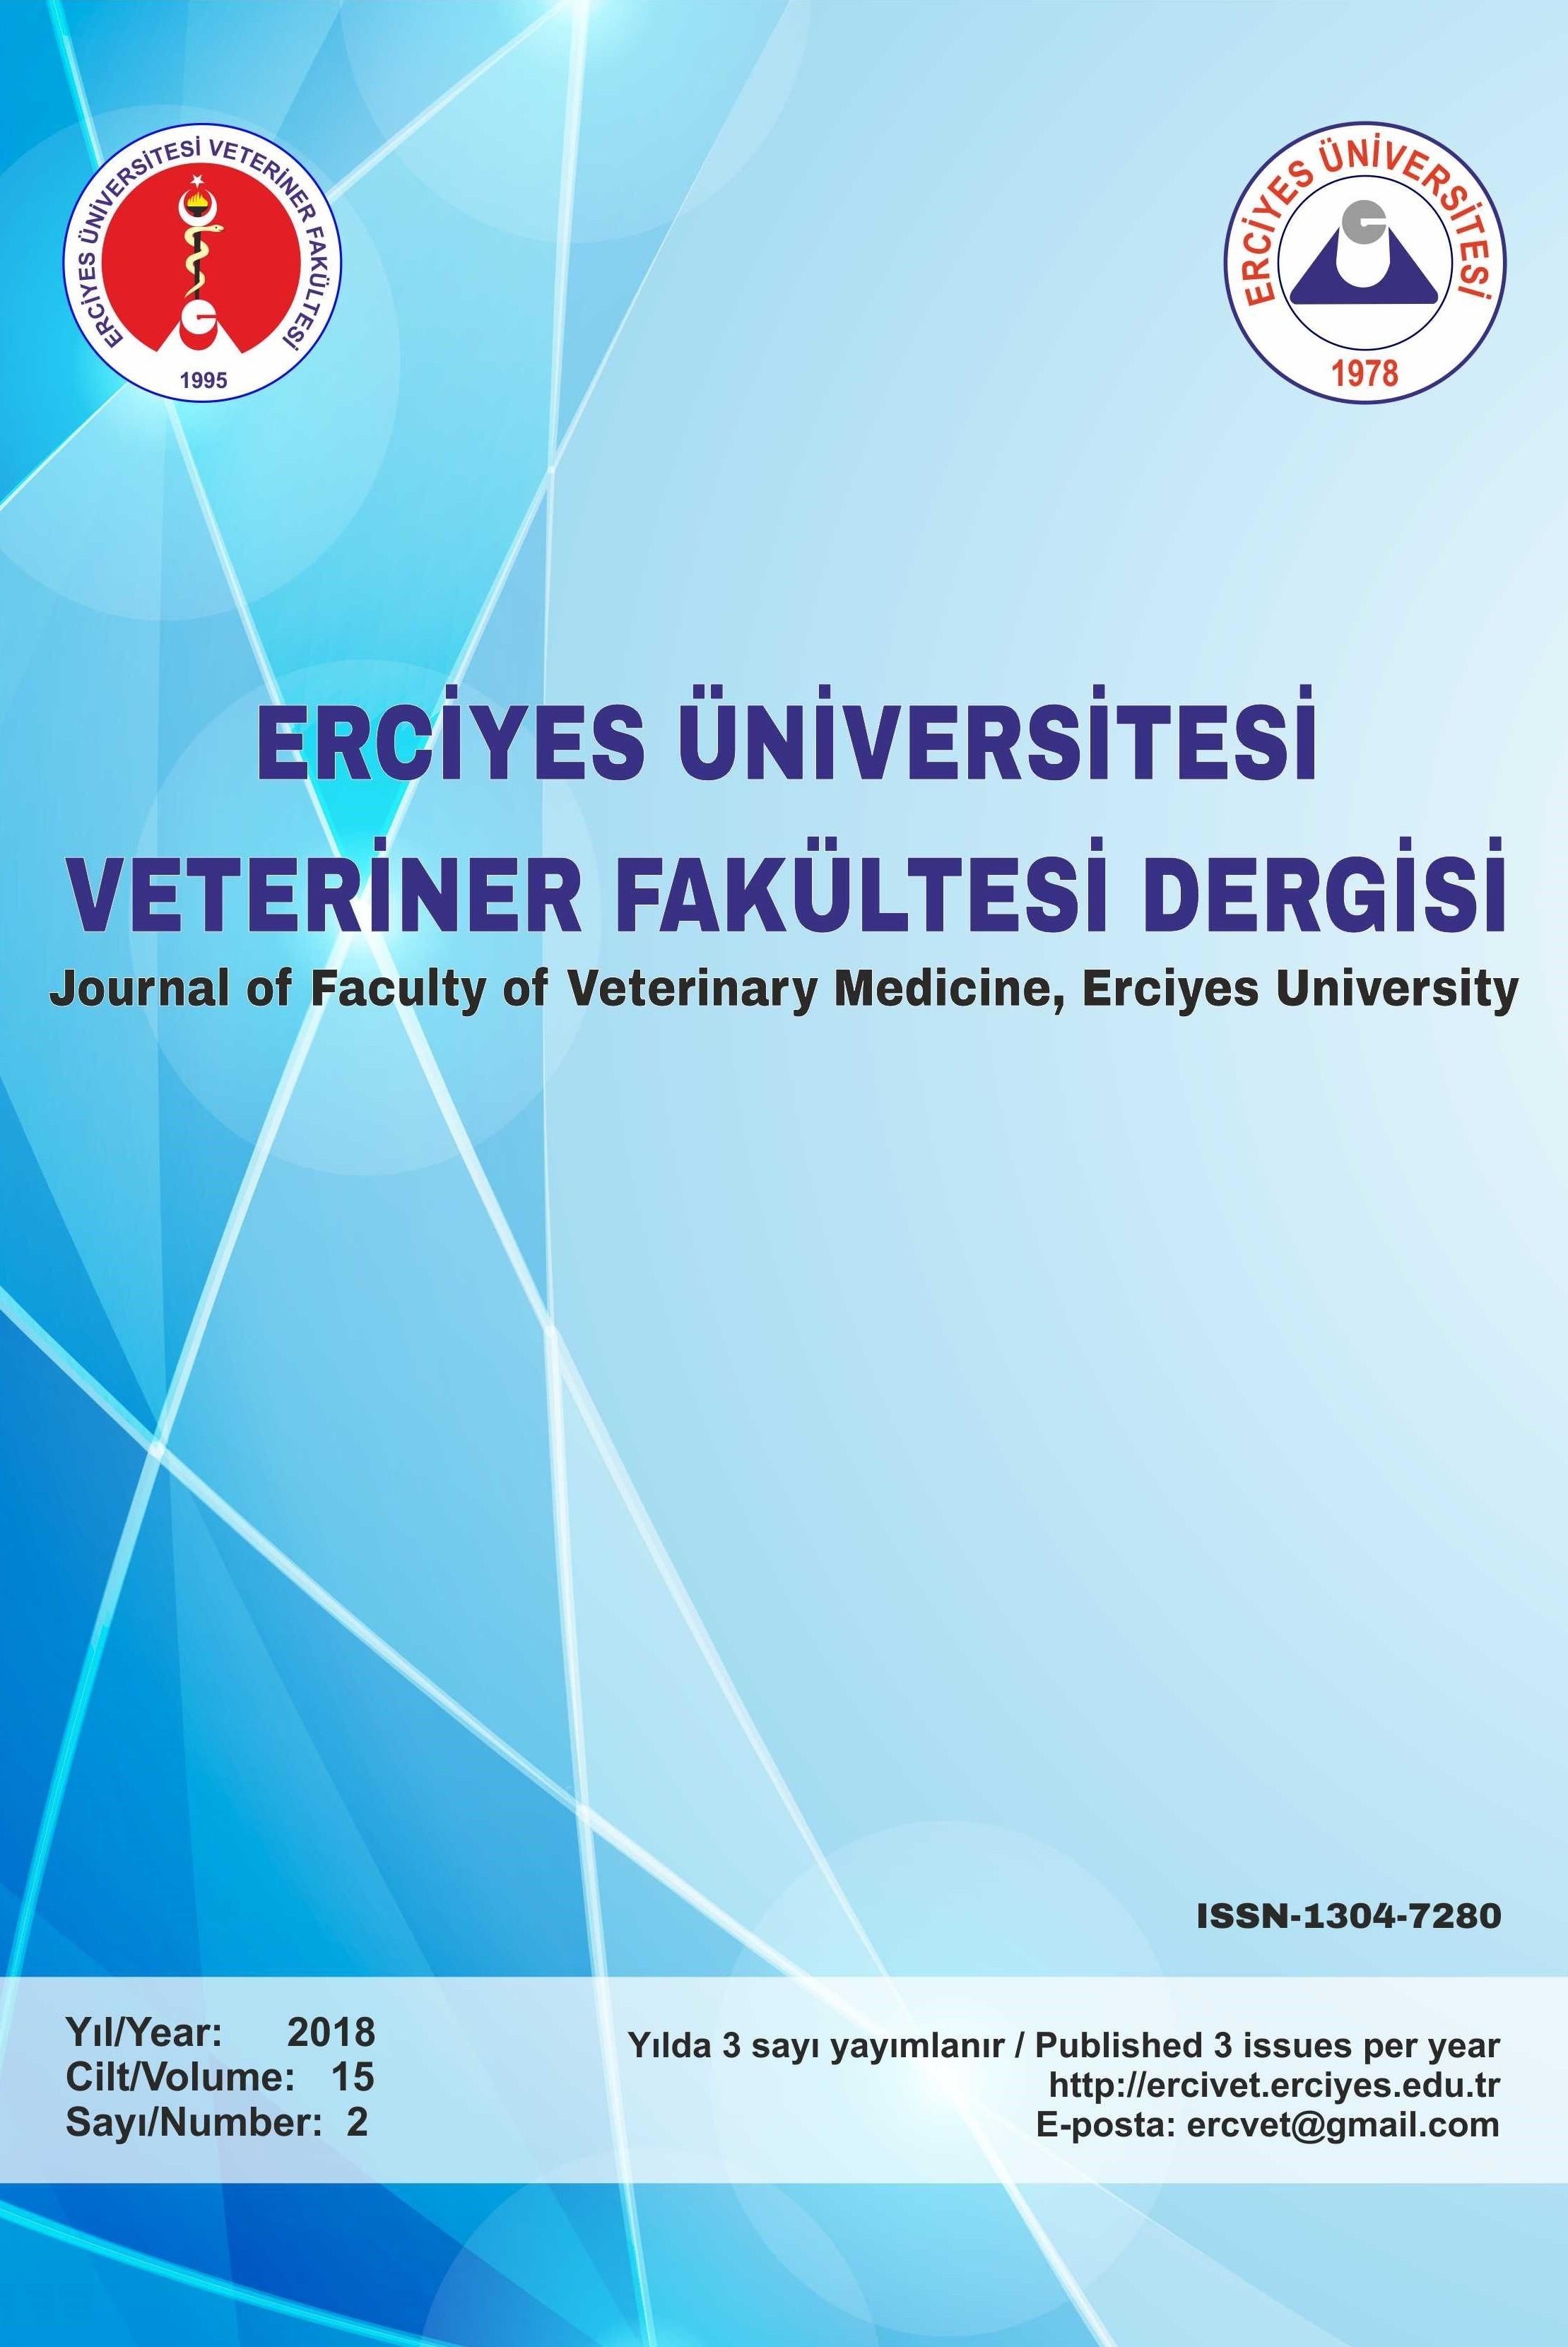 Erciyes Üniversitesi Veteriner Fakültesi Dergisi